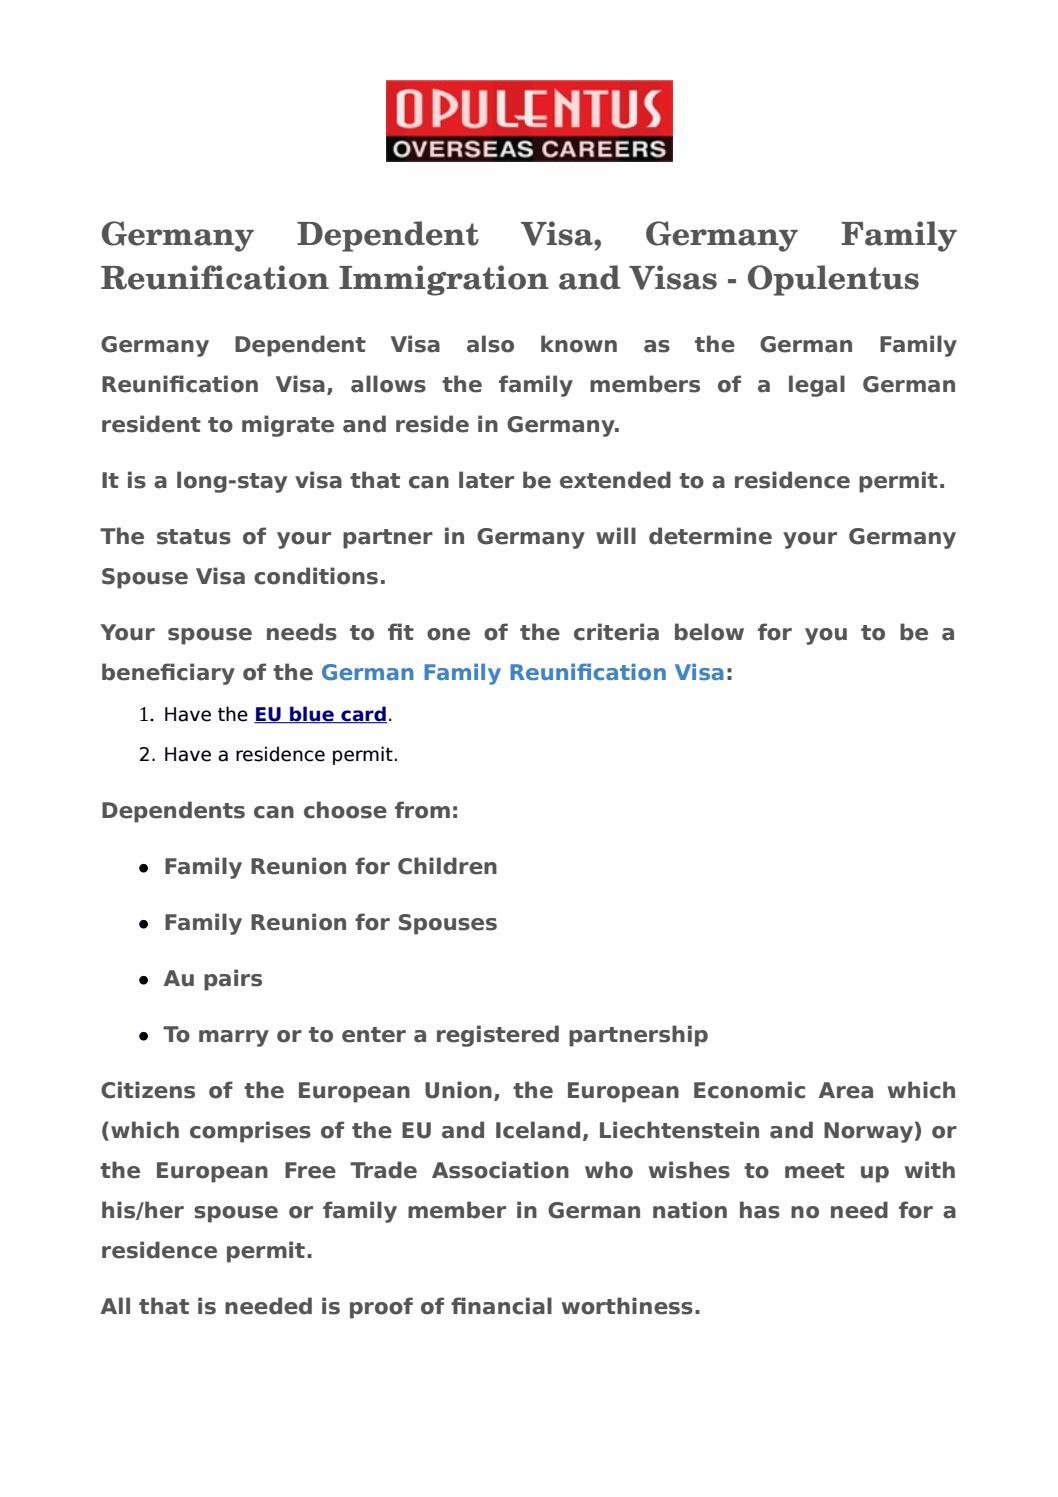 germany dependent visa germany family